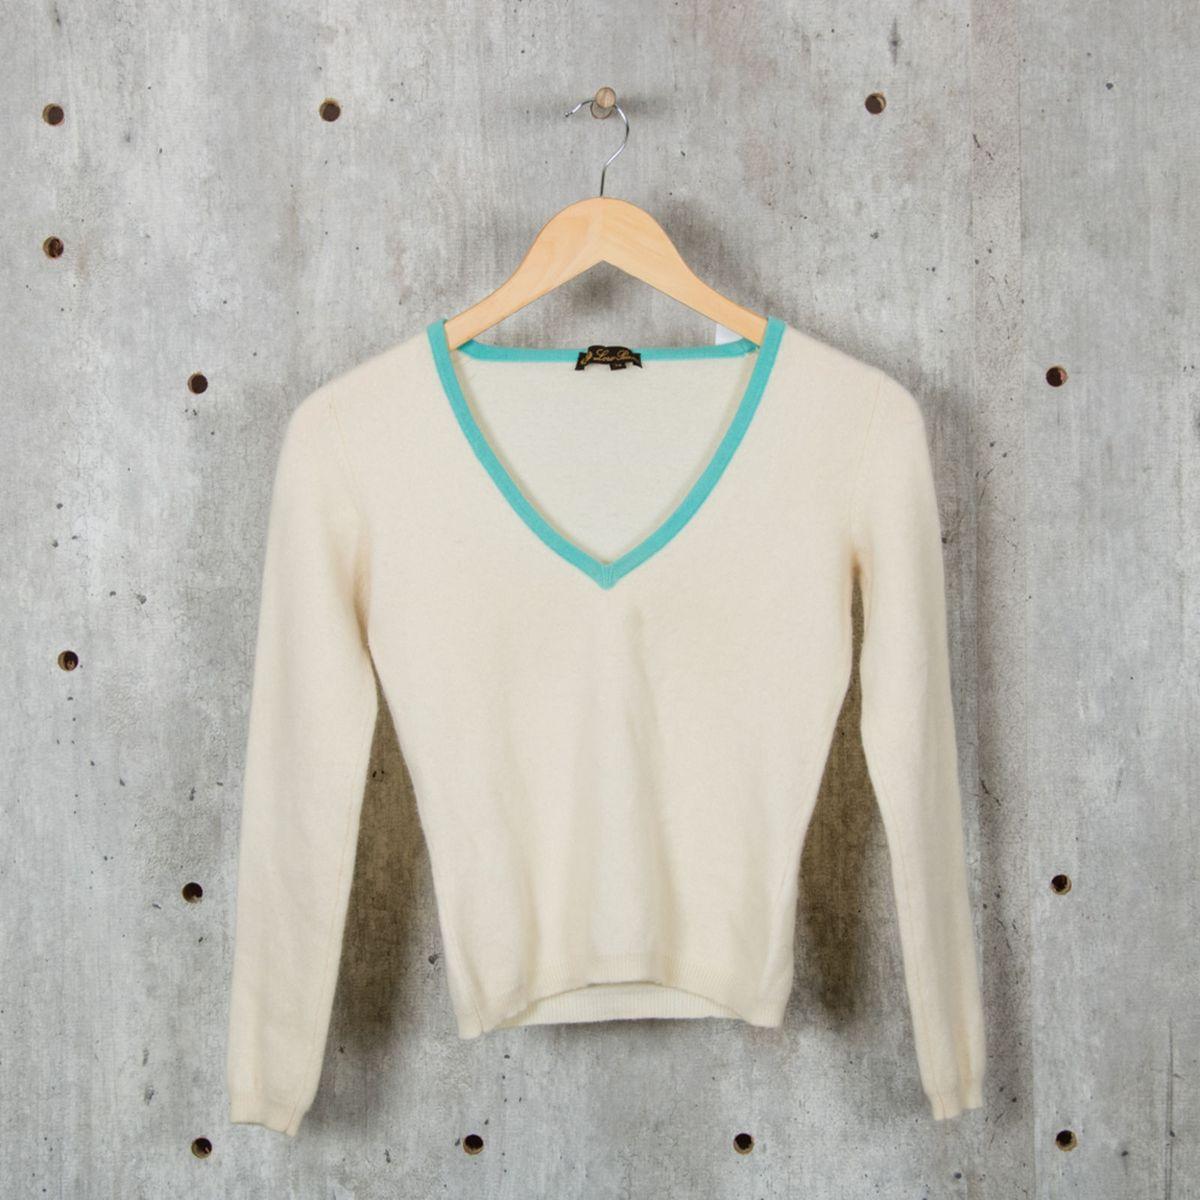 6b3aef661 Suéter de Cashmere Creme   Blusa Feminina Loro Piana Usado 26079345   enjoei